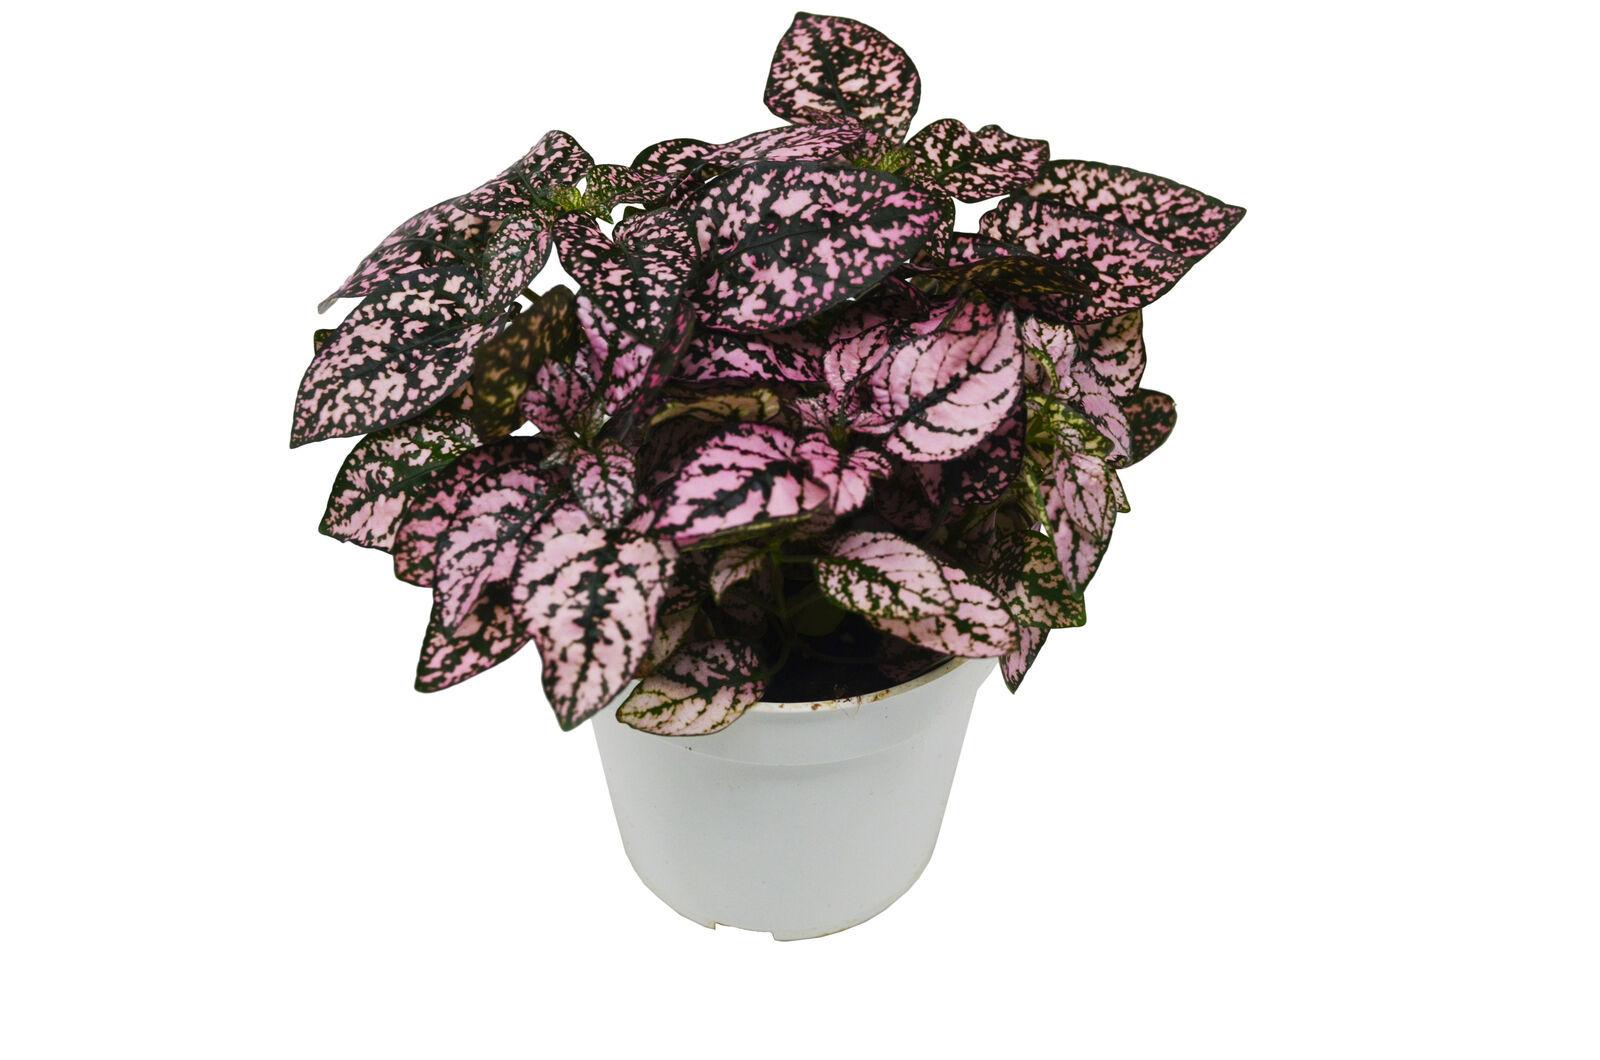 "Hypoestes Pink (Polka Dot Plant) - 4"" Pot - Live Plant - Outdoor Living - D11 - $33.99"